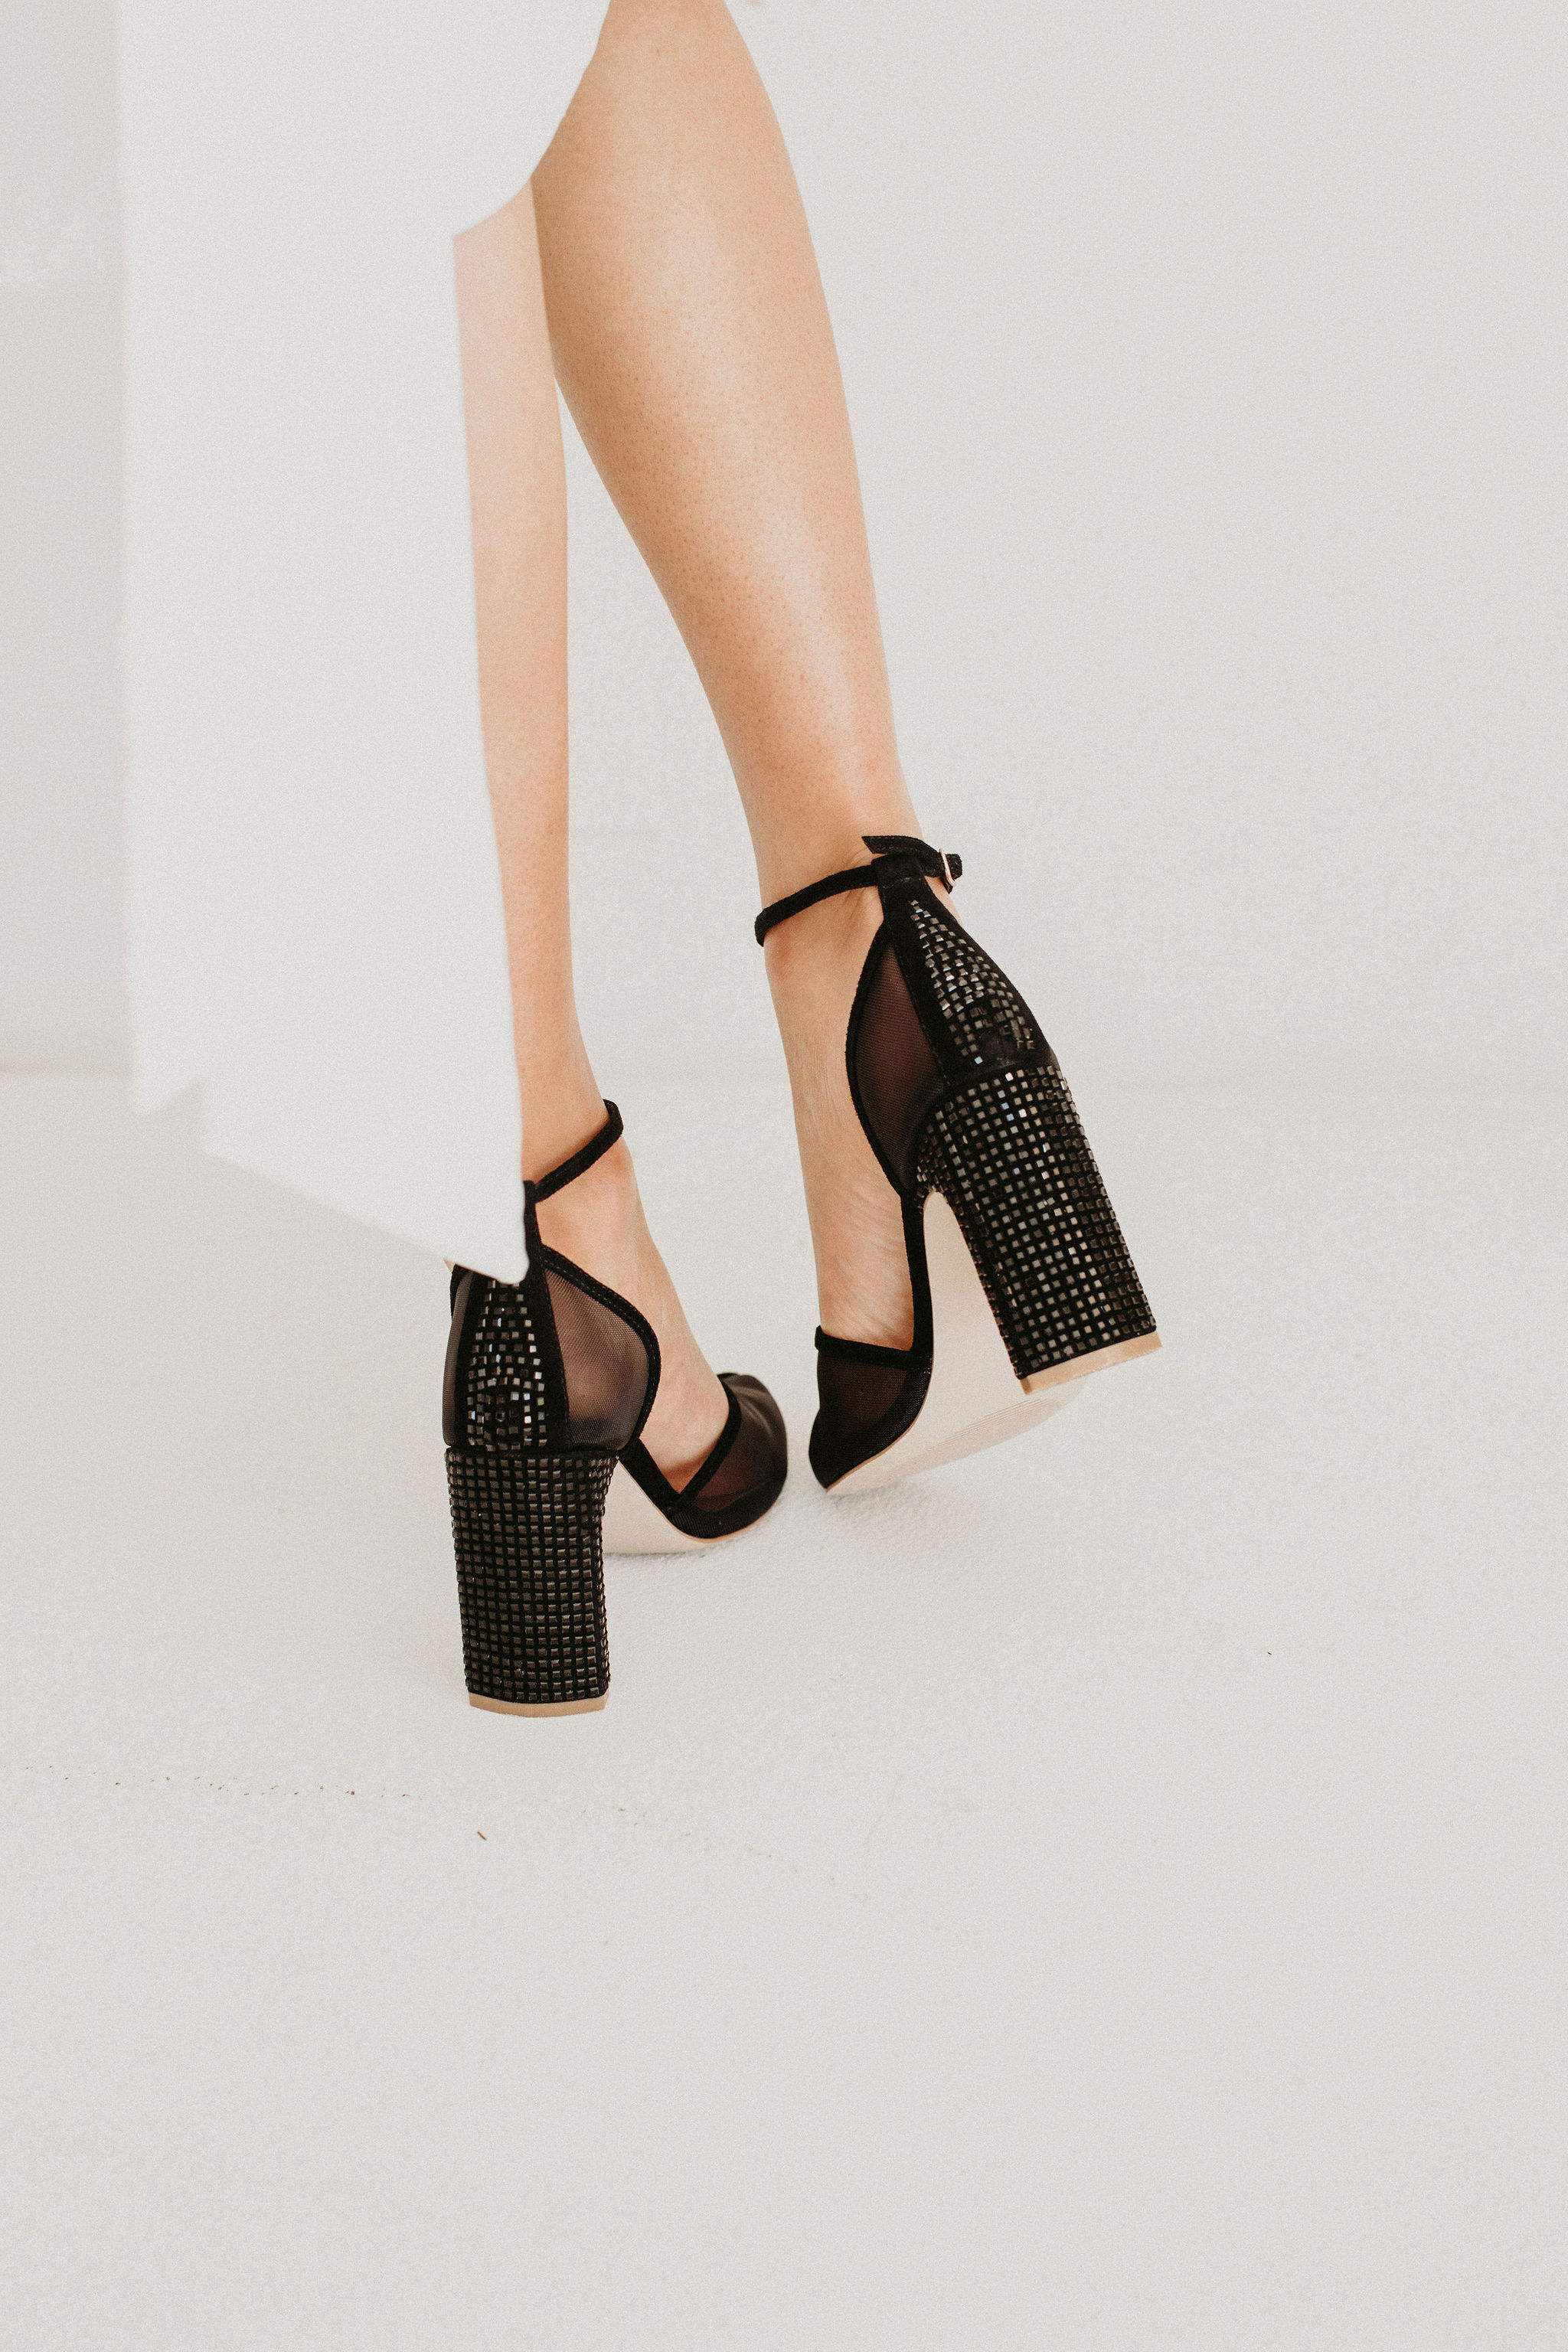 Comfortable Black Wedding Heels